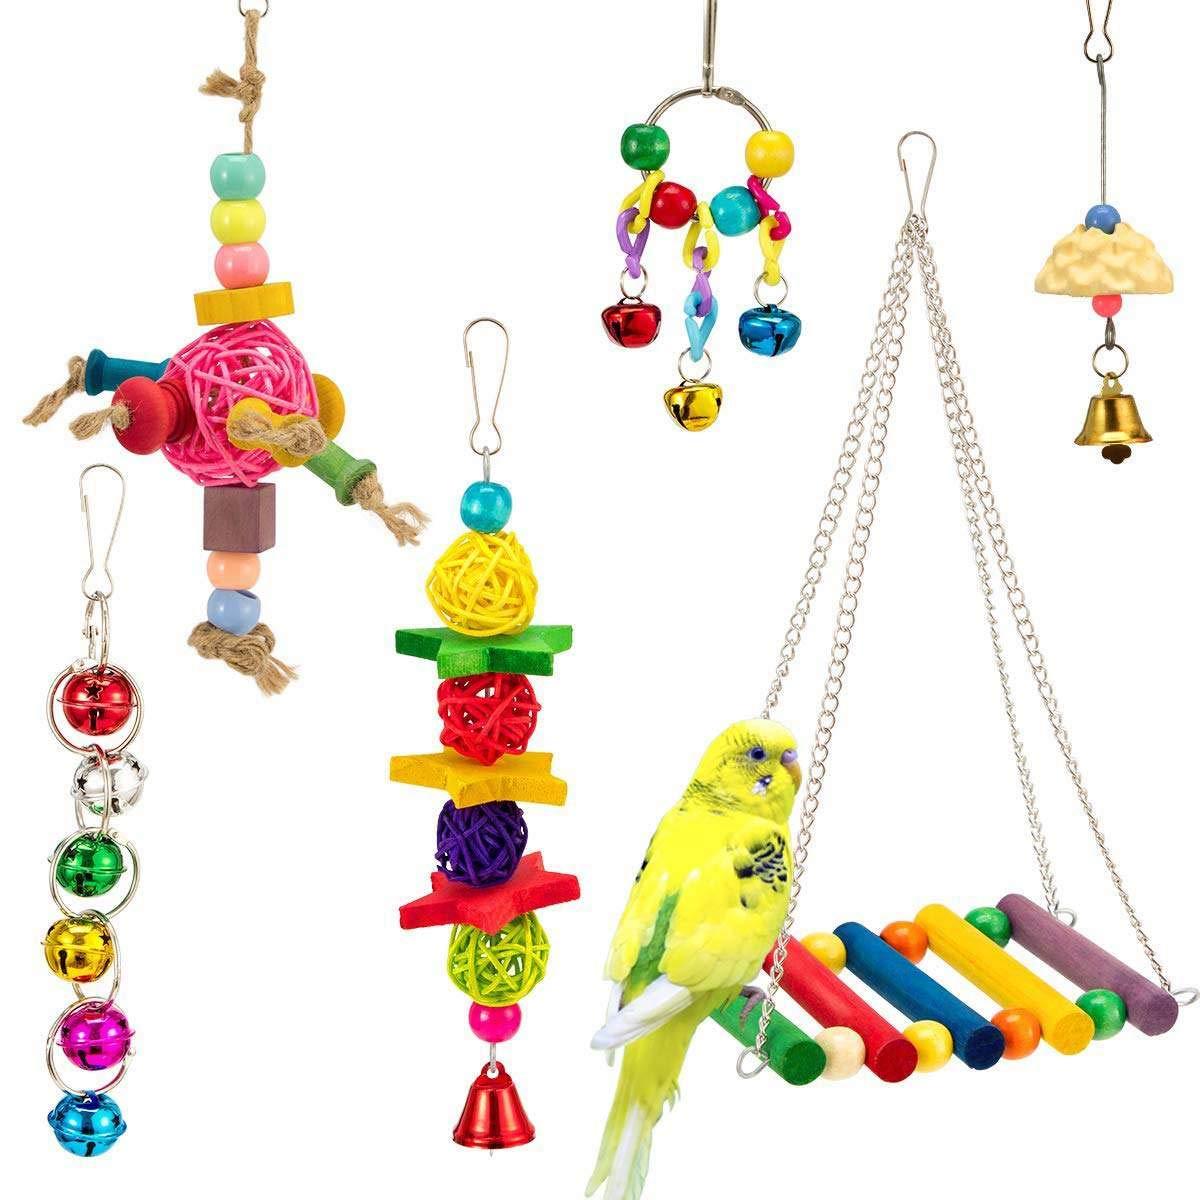 Bird Toys - Small Parrot Set Toy Color Swing Five Pointed Star Bell String Foot Claws Rattan Ball - Nest Prime Hangers Under Bird Medium Bells Perches Sticks Kabob Grey Balls Rawhide Talkin by Nolvalz